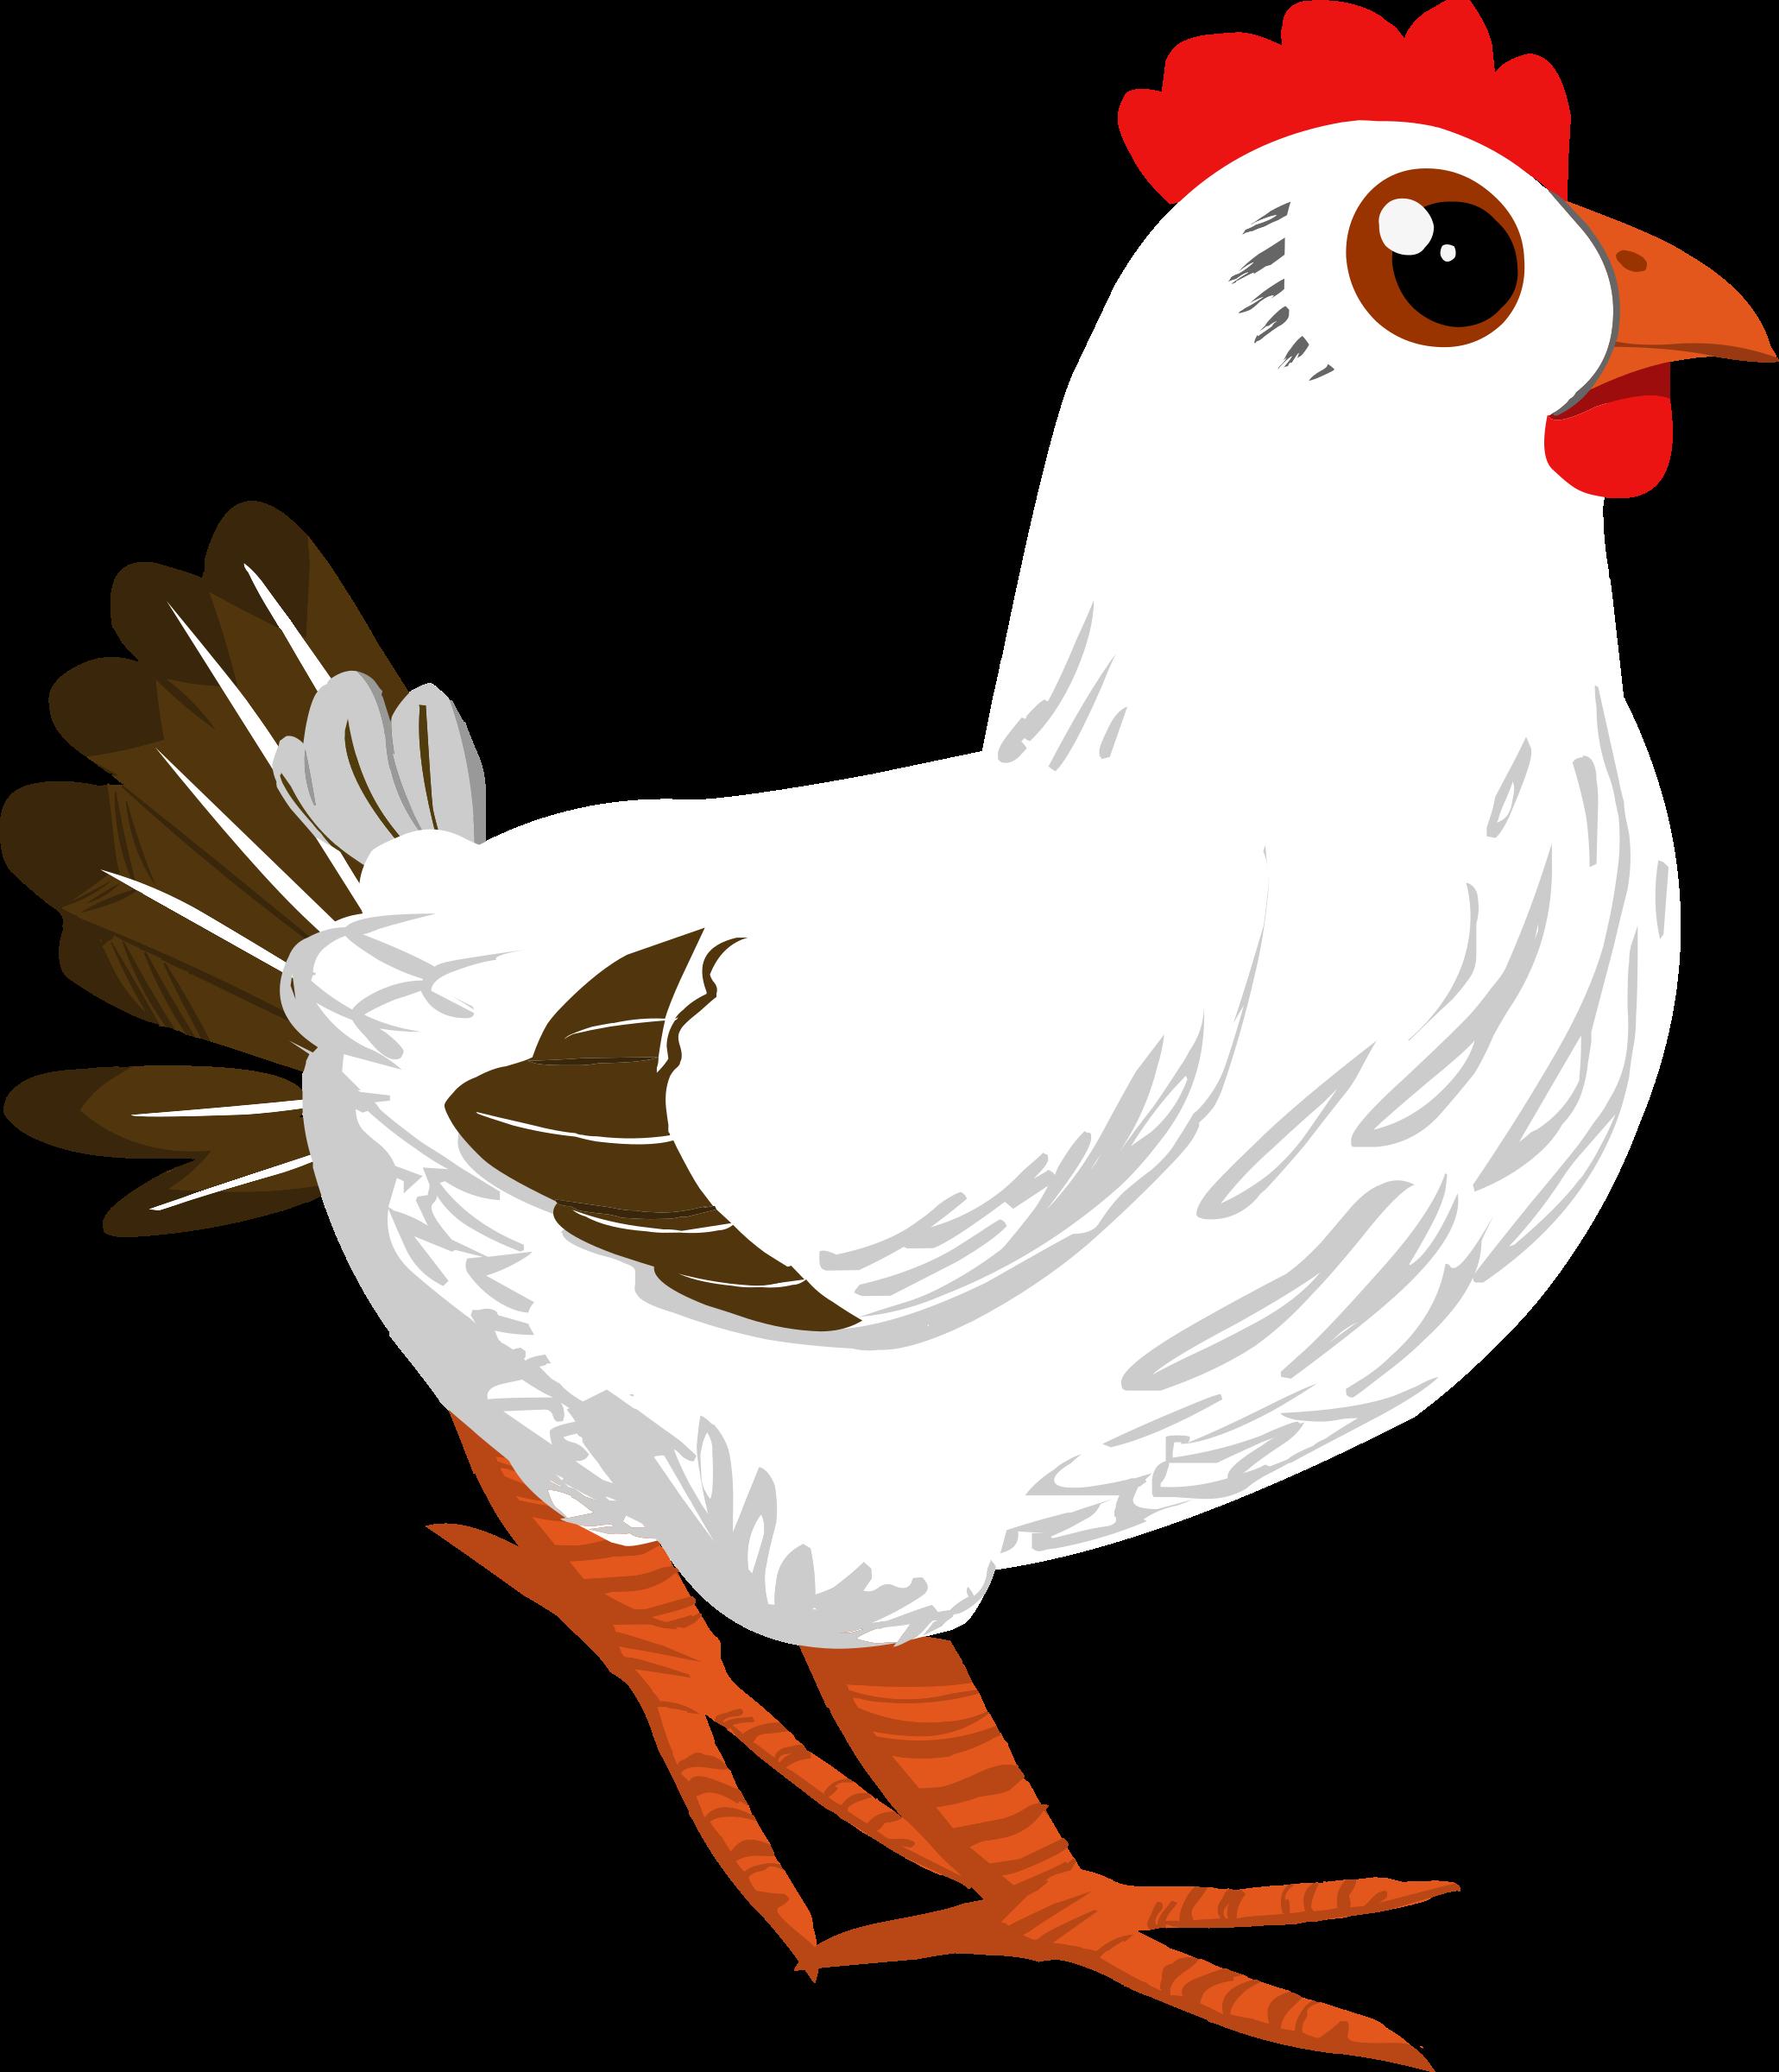 Inhabitants npc big image. Clipart chicken tail